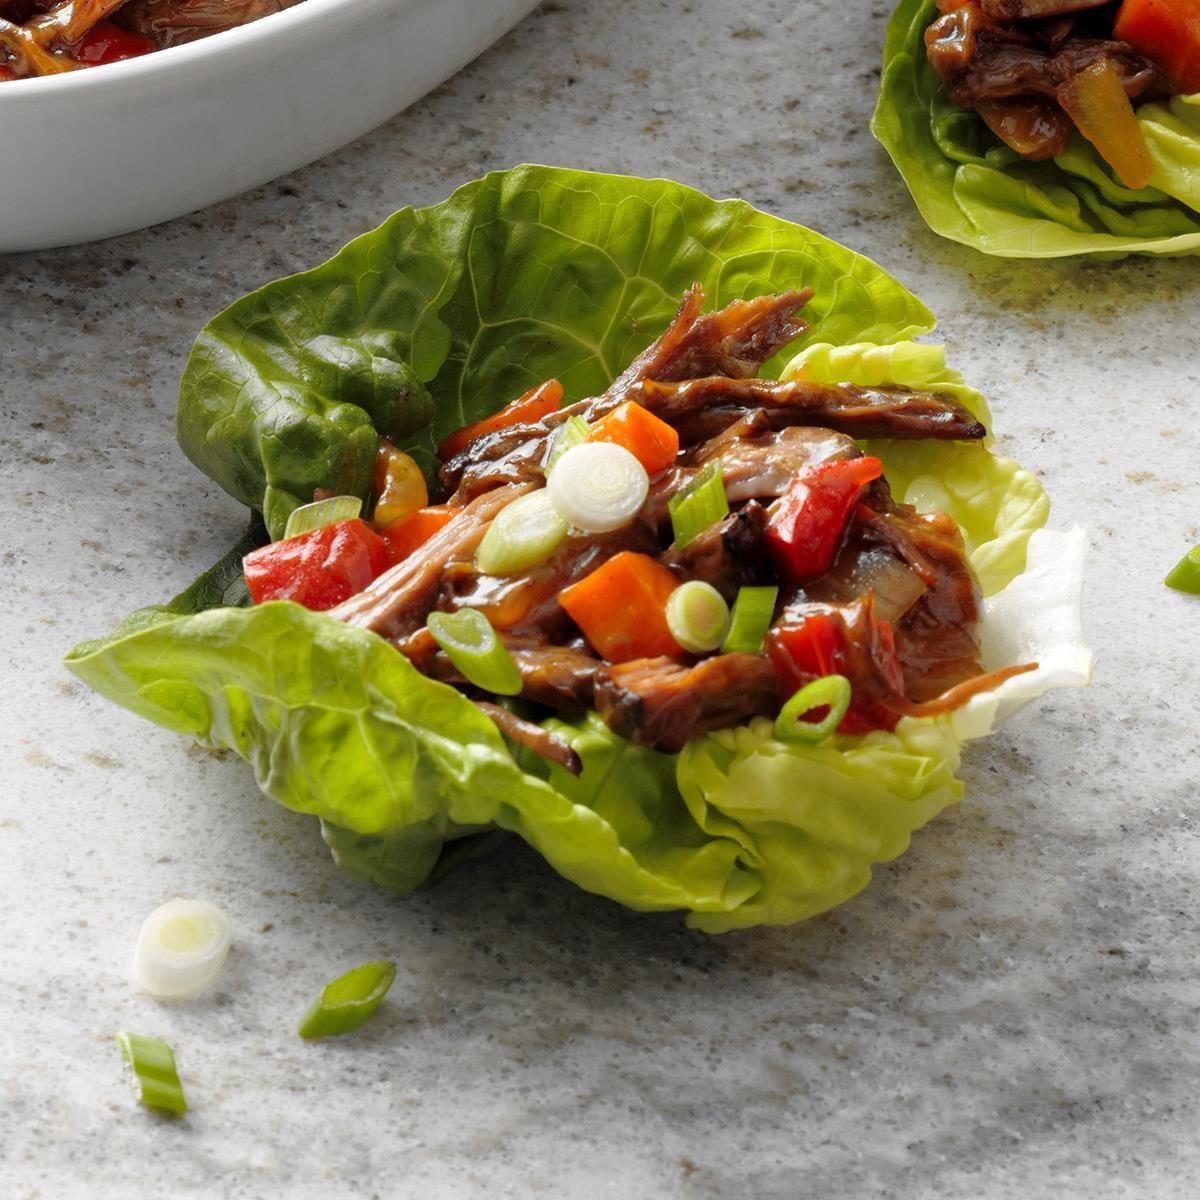 Pressure Cooker Shredded Beef Lettuce Cups